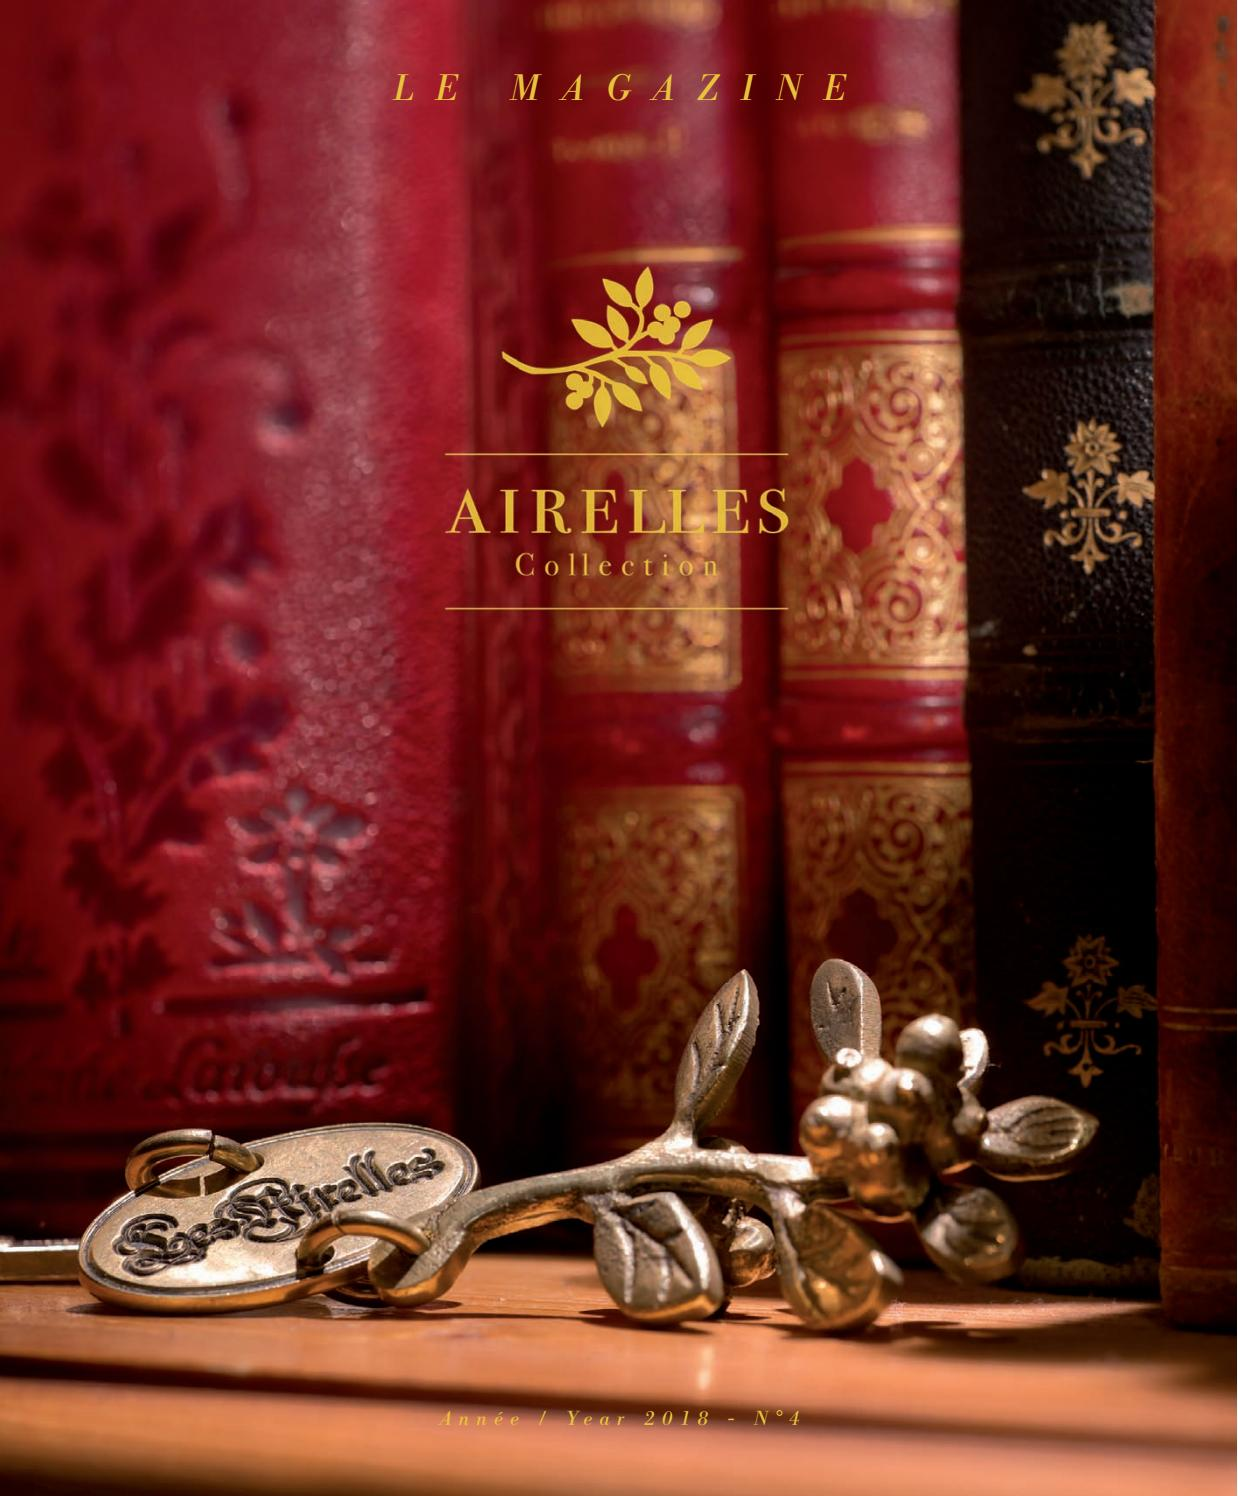 Les airelles 2017 18 s by Riviera Magazine - issuu bf822e5b001